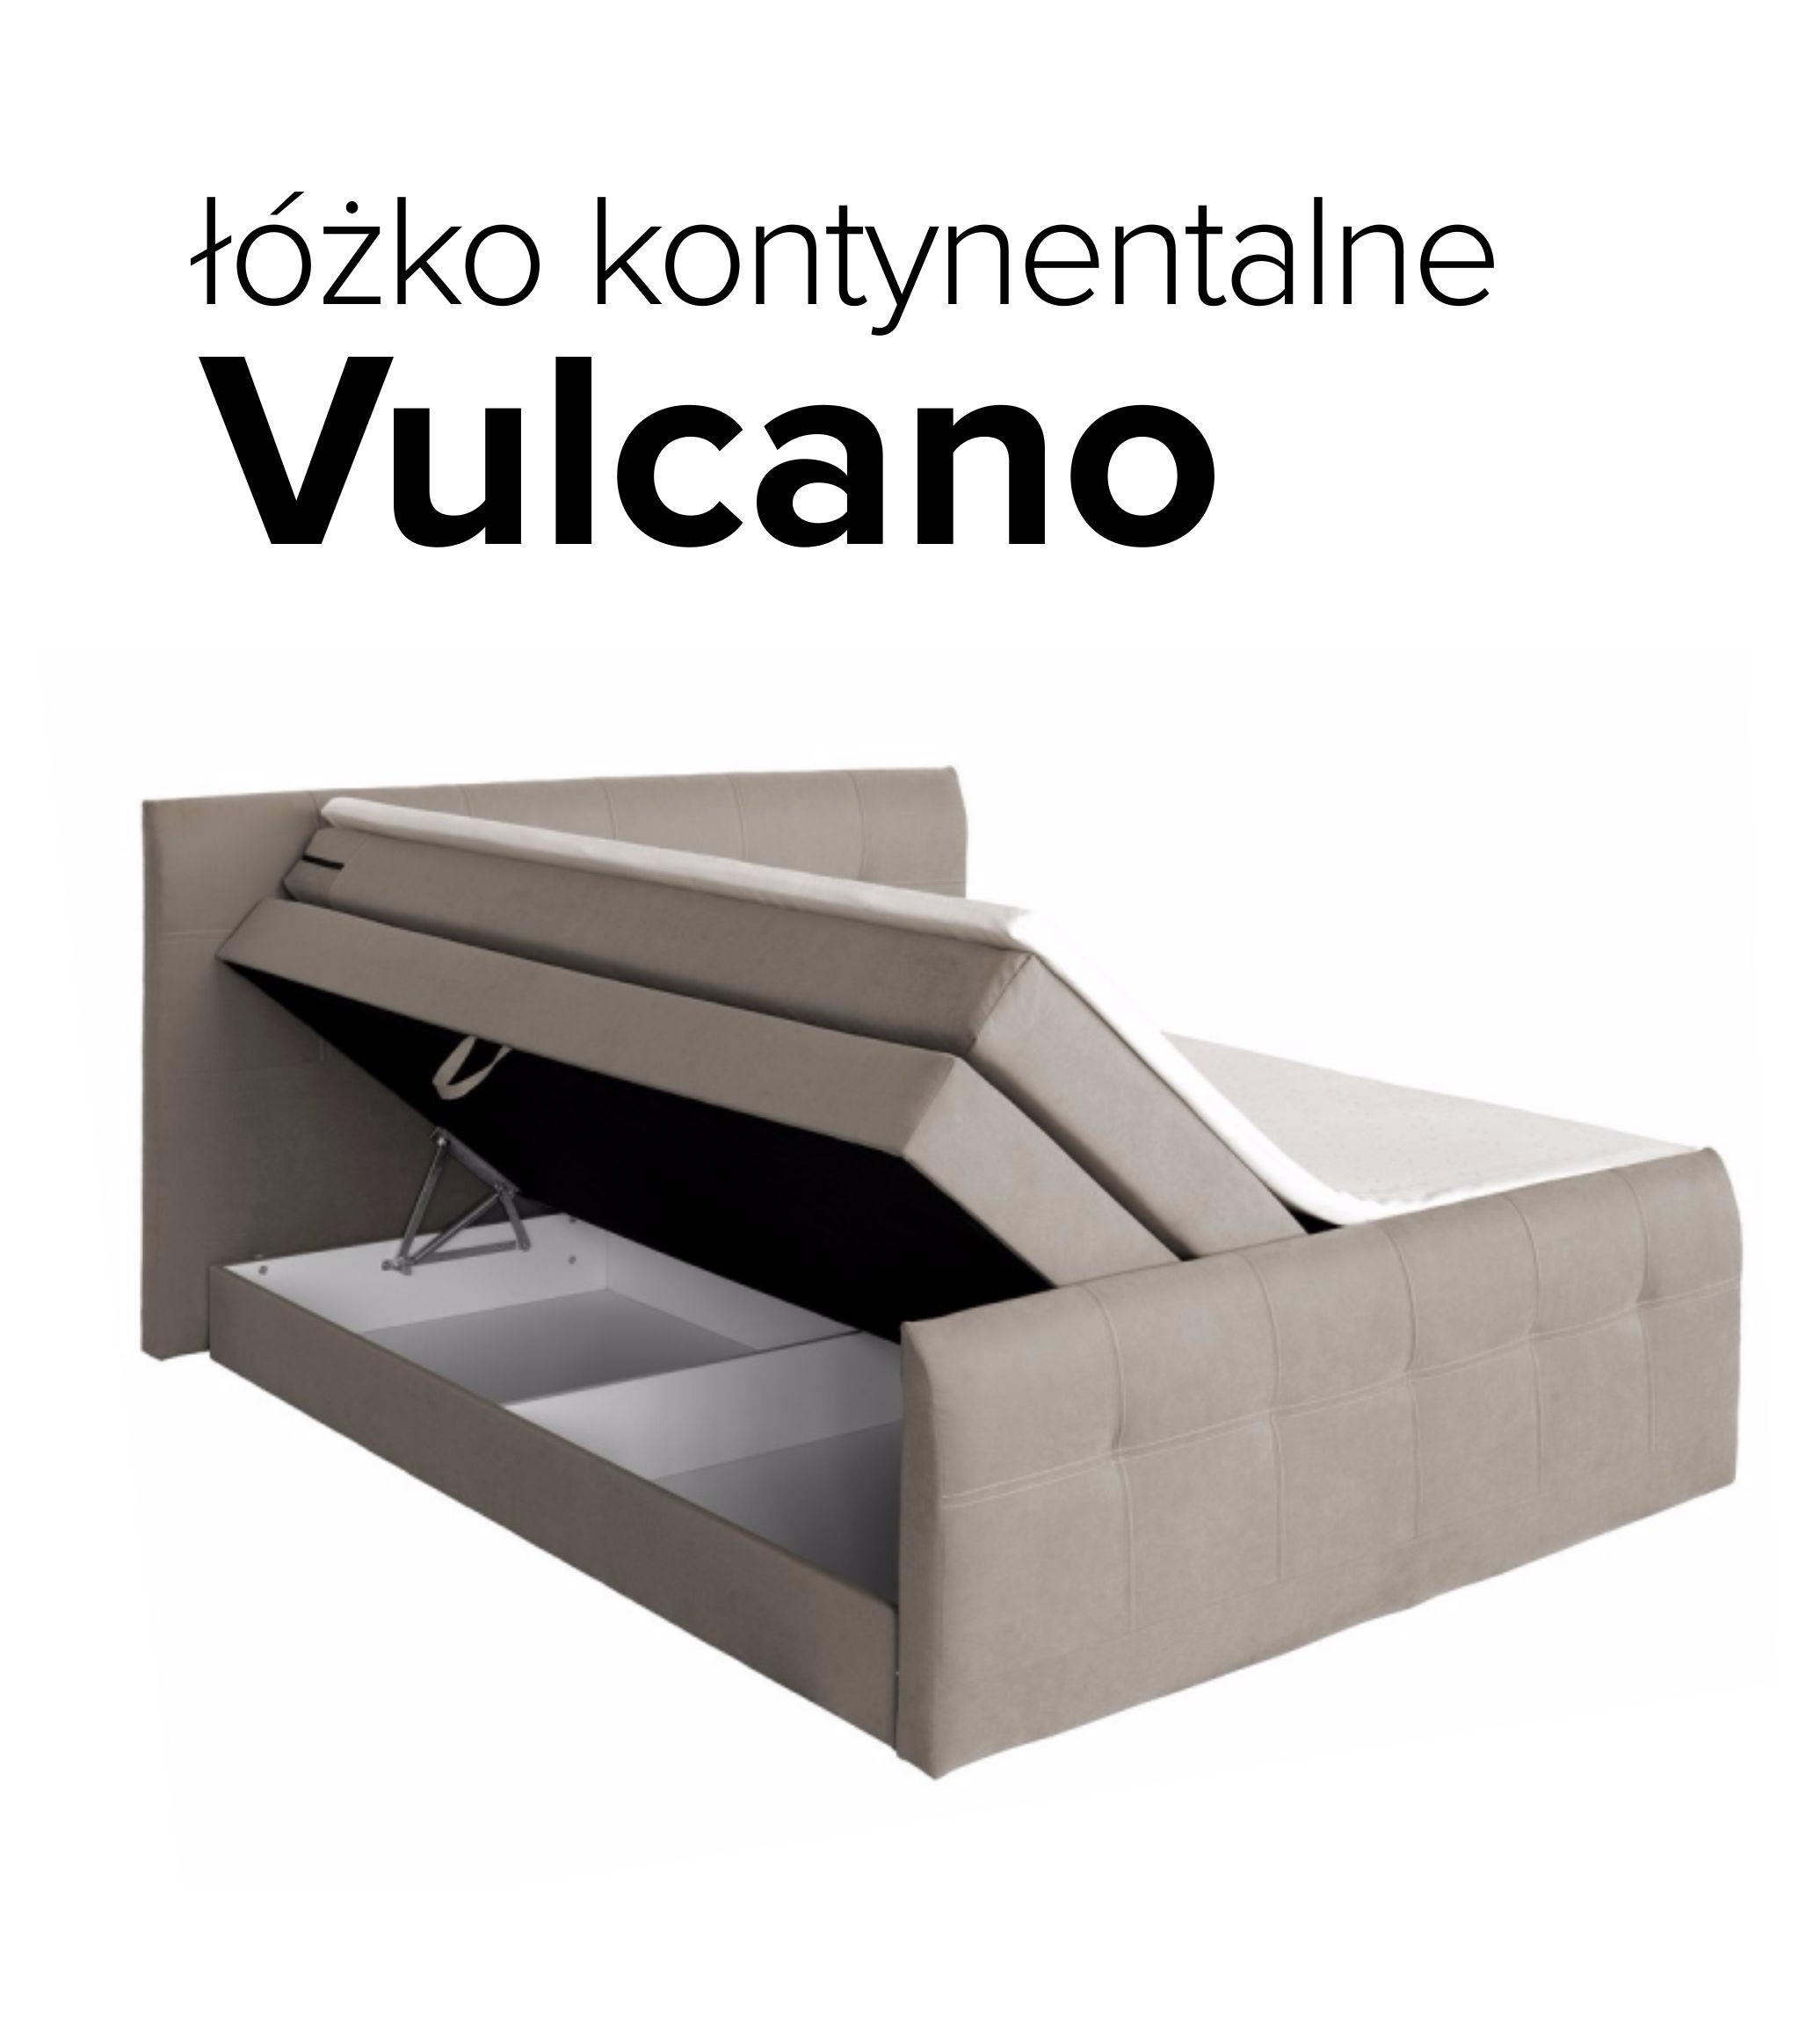 https://selsey.pl/p/5/6701/lozko-kontynentalne-vulcano